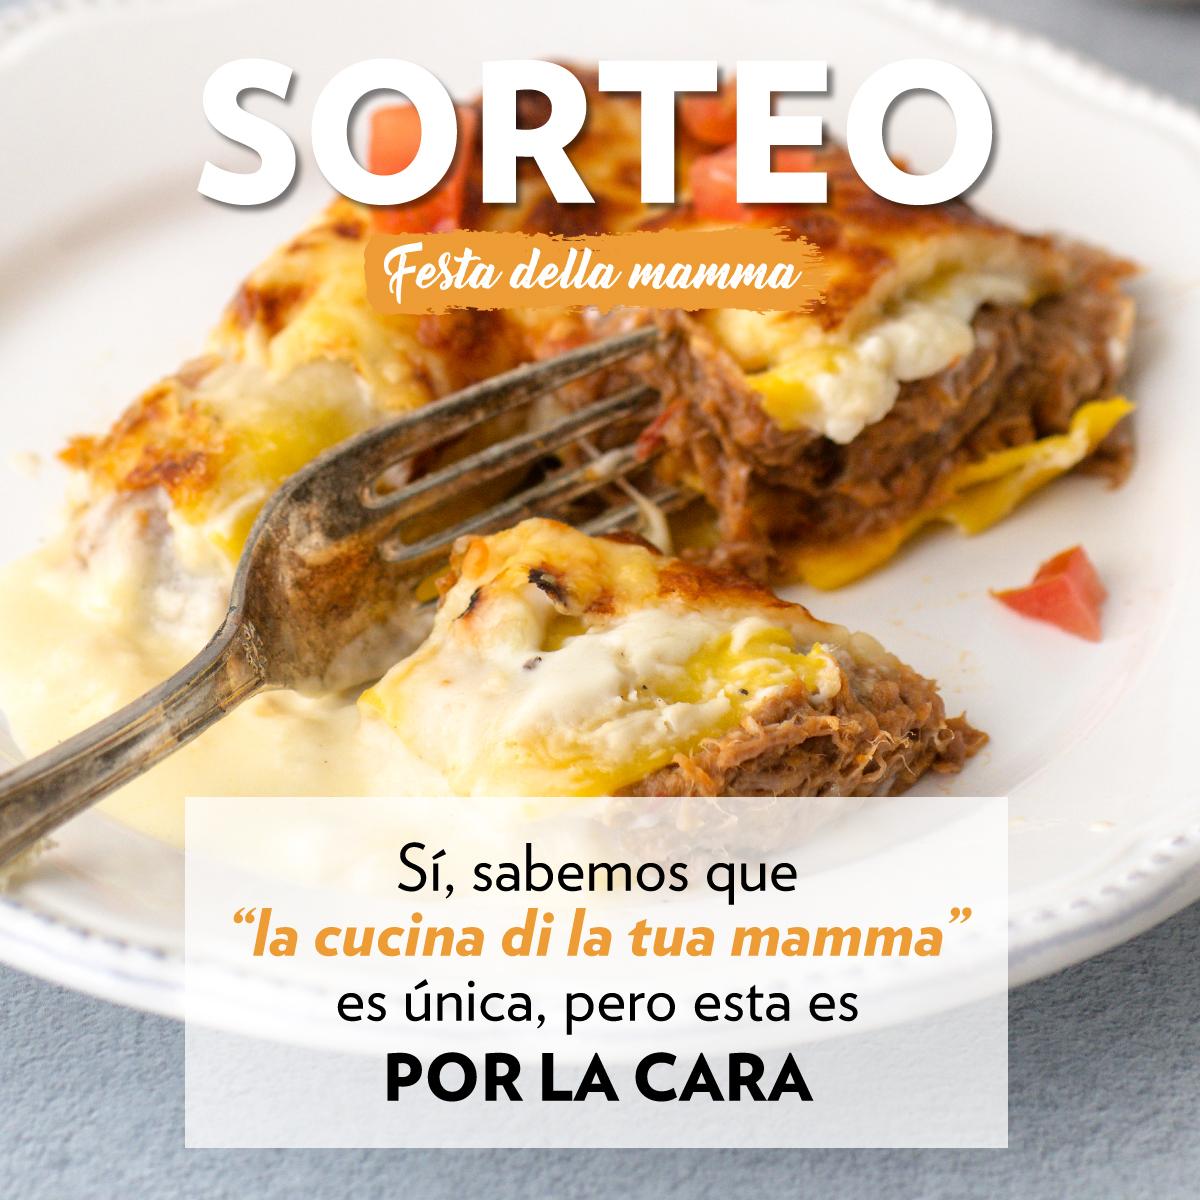 RRSS Sorteo San Dia de la Madre FEED 1 - Sorteo Día de la Madre. ¡Celebra la 'festa della Mamma'!